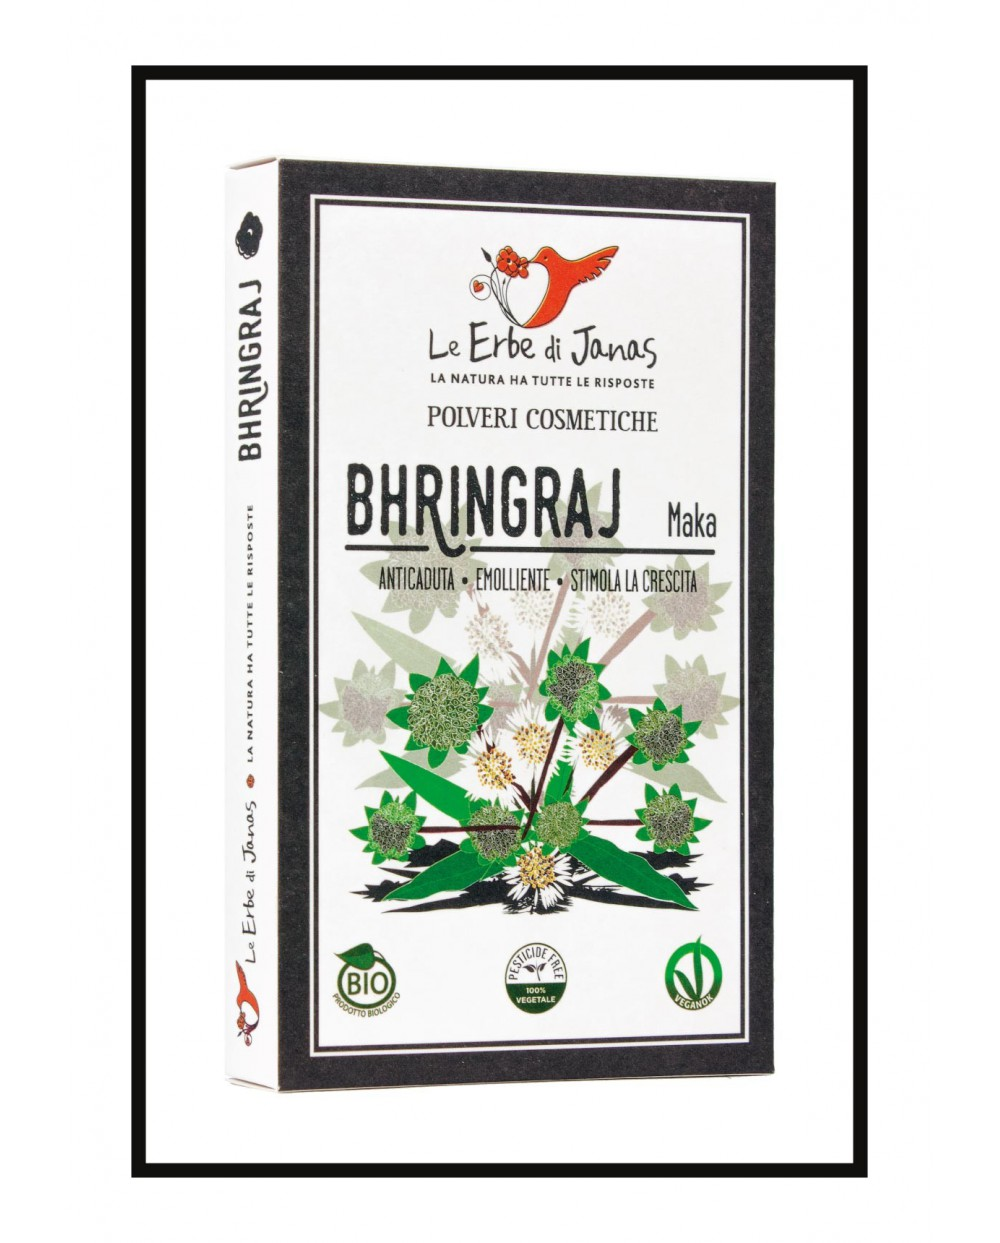 Le Erbe di Janas - Bhringraj (Maka)